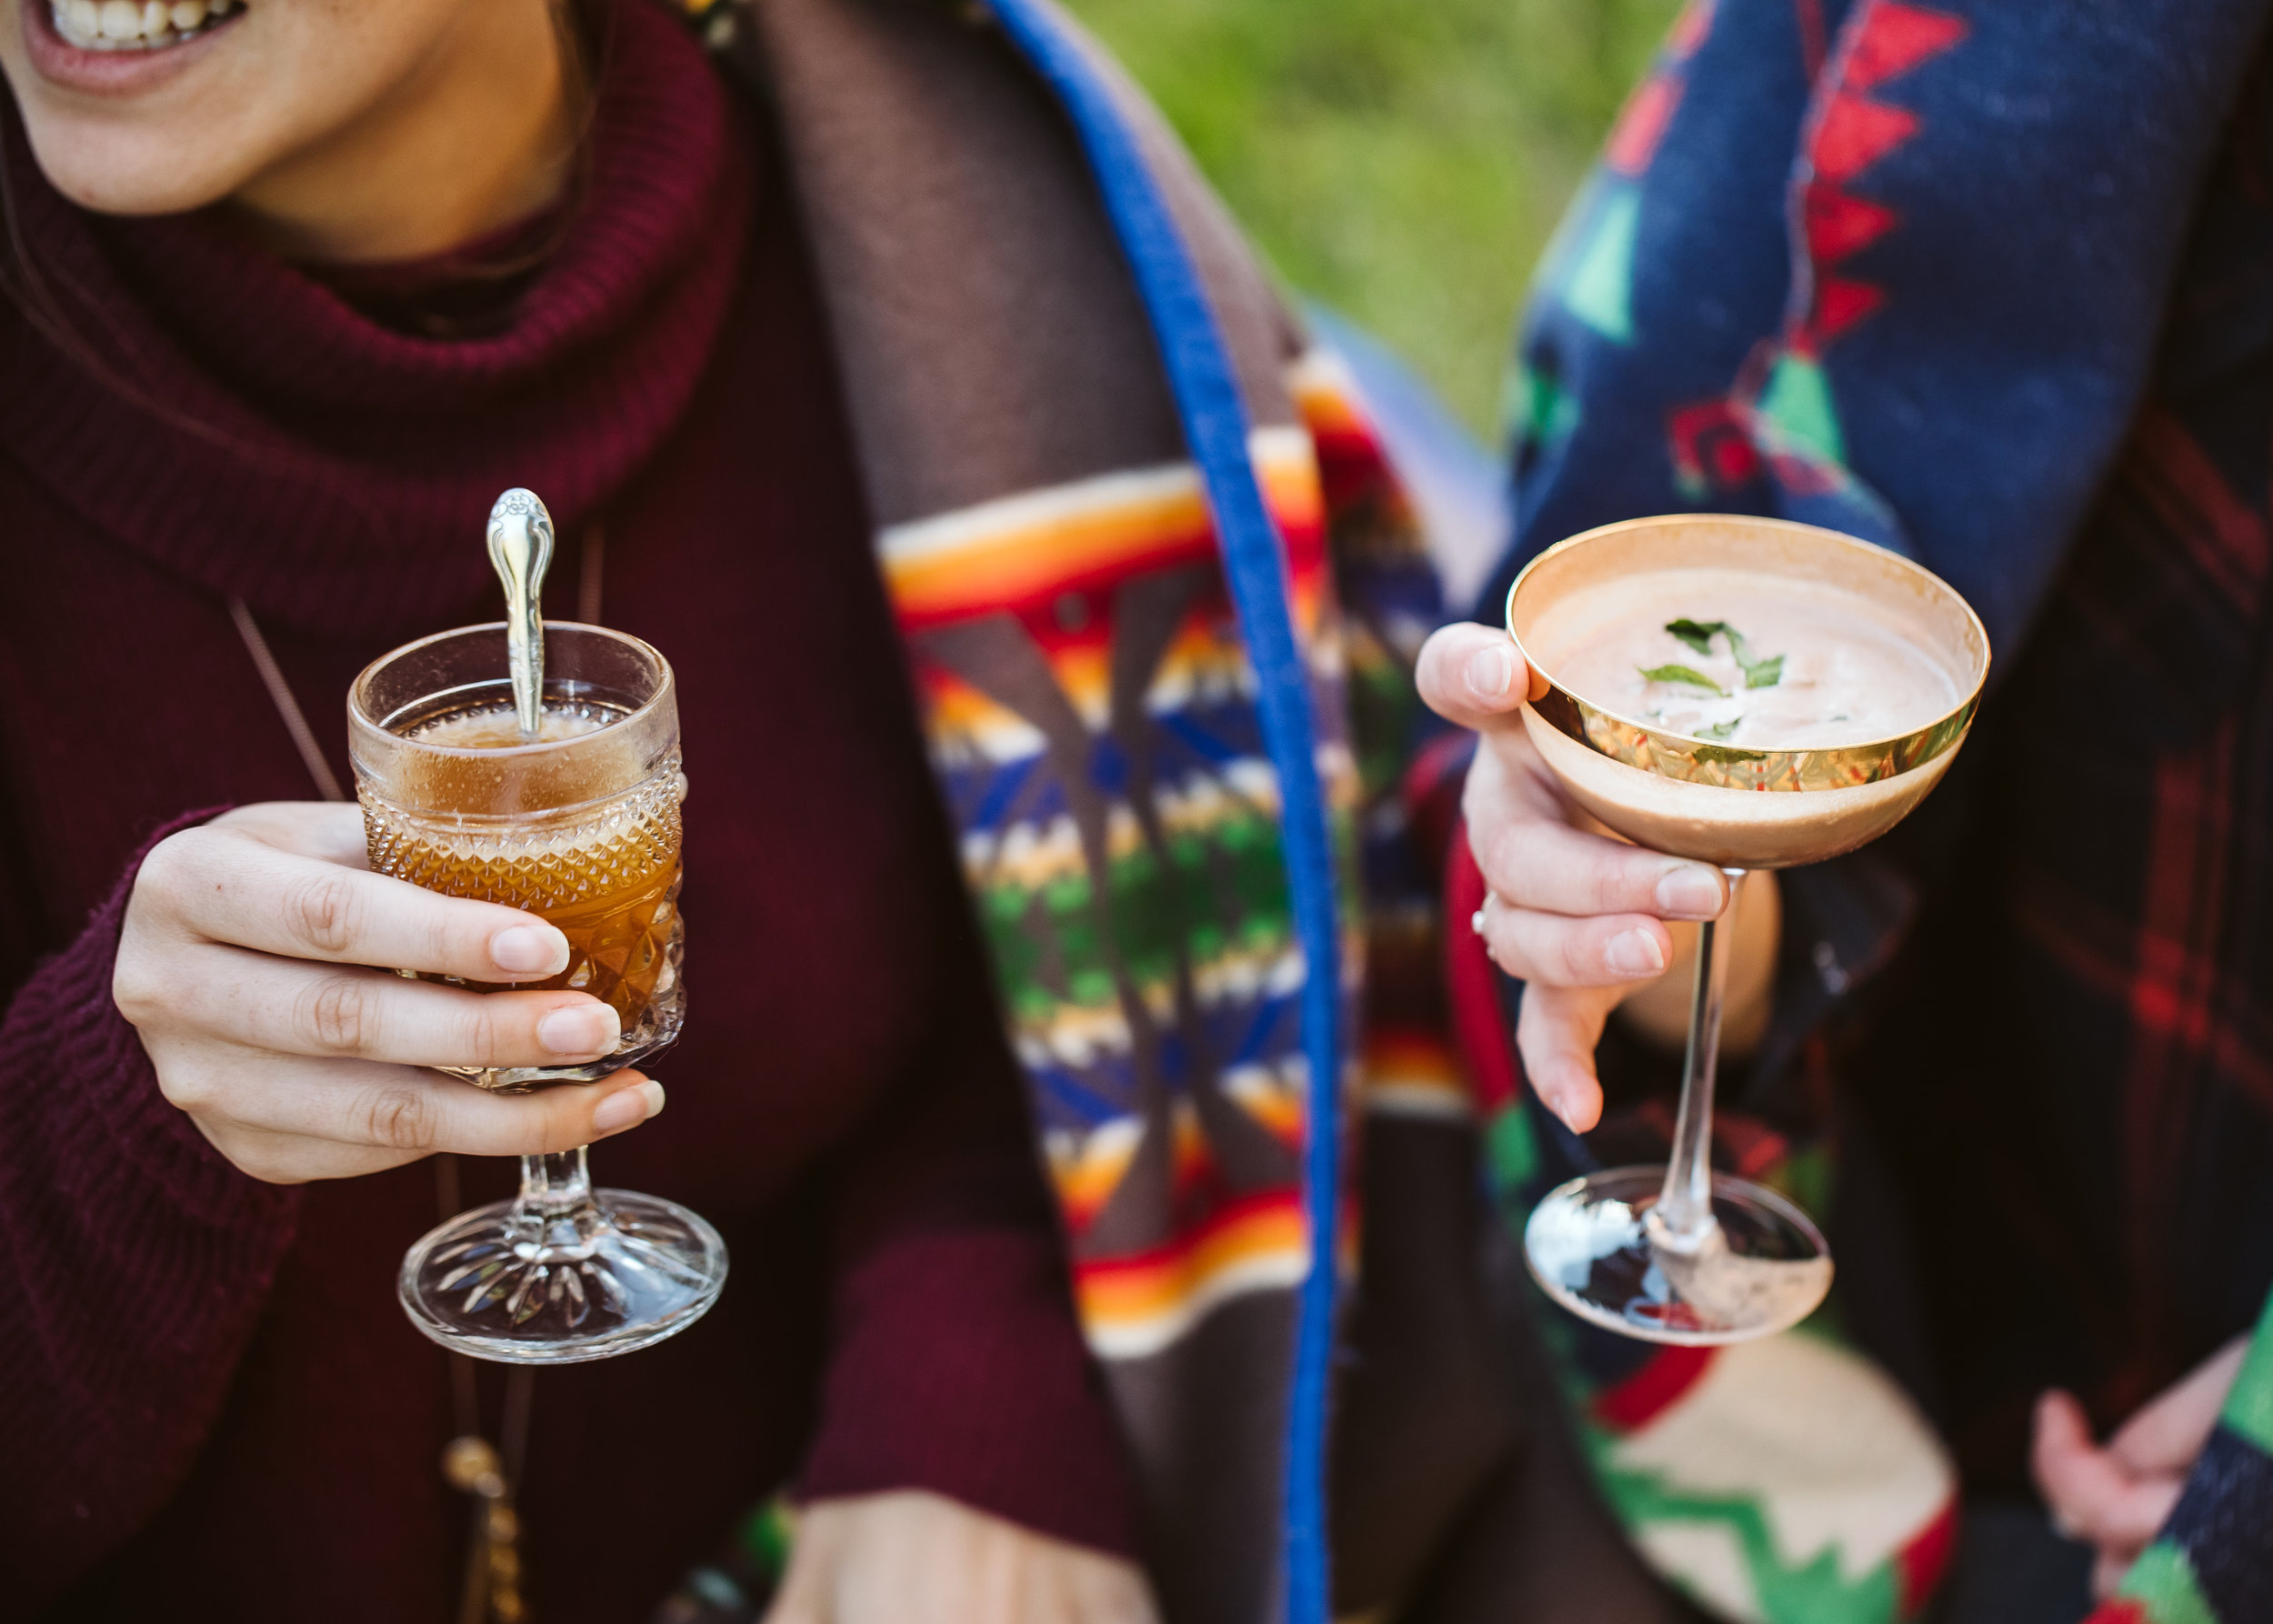 Pullman Cocktail Co | Adri Guyer Photo 01.jpg